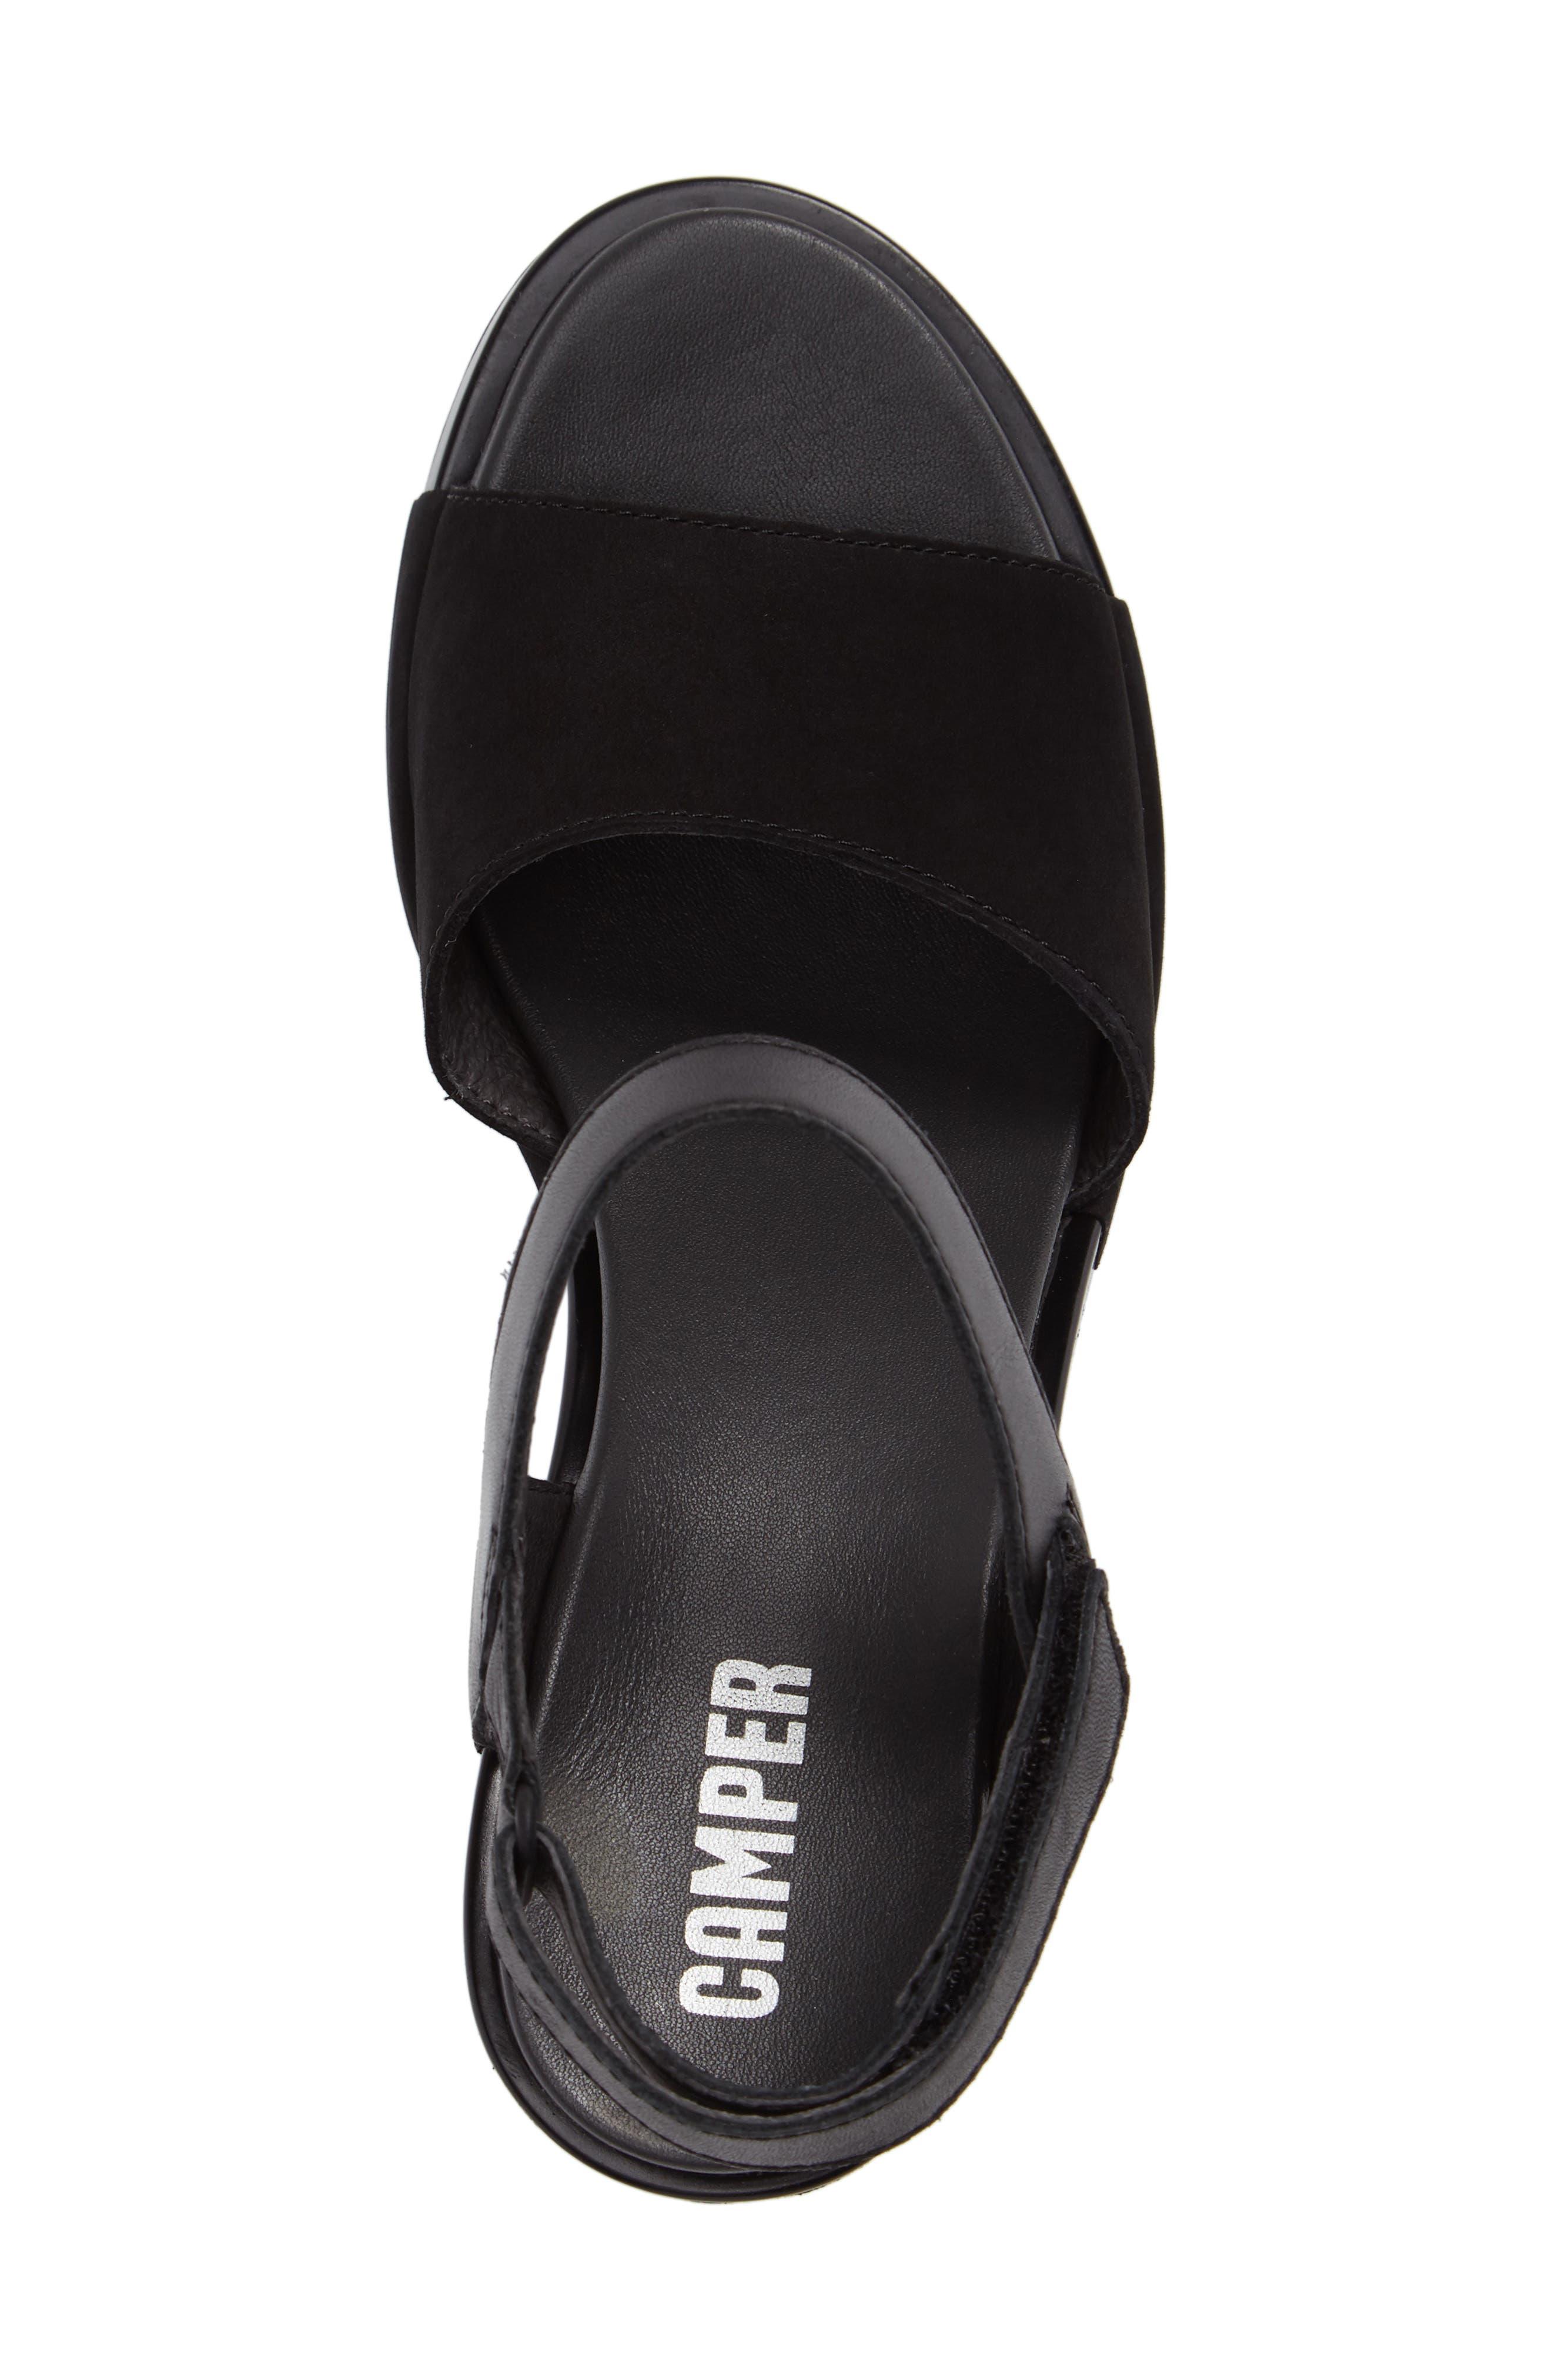 Ivy Ankle Strap Sandal,                             Alternate thumbnail 3, color,                             Black Leather